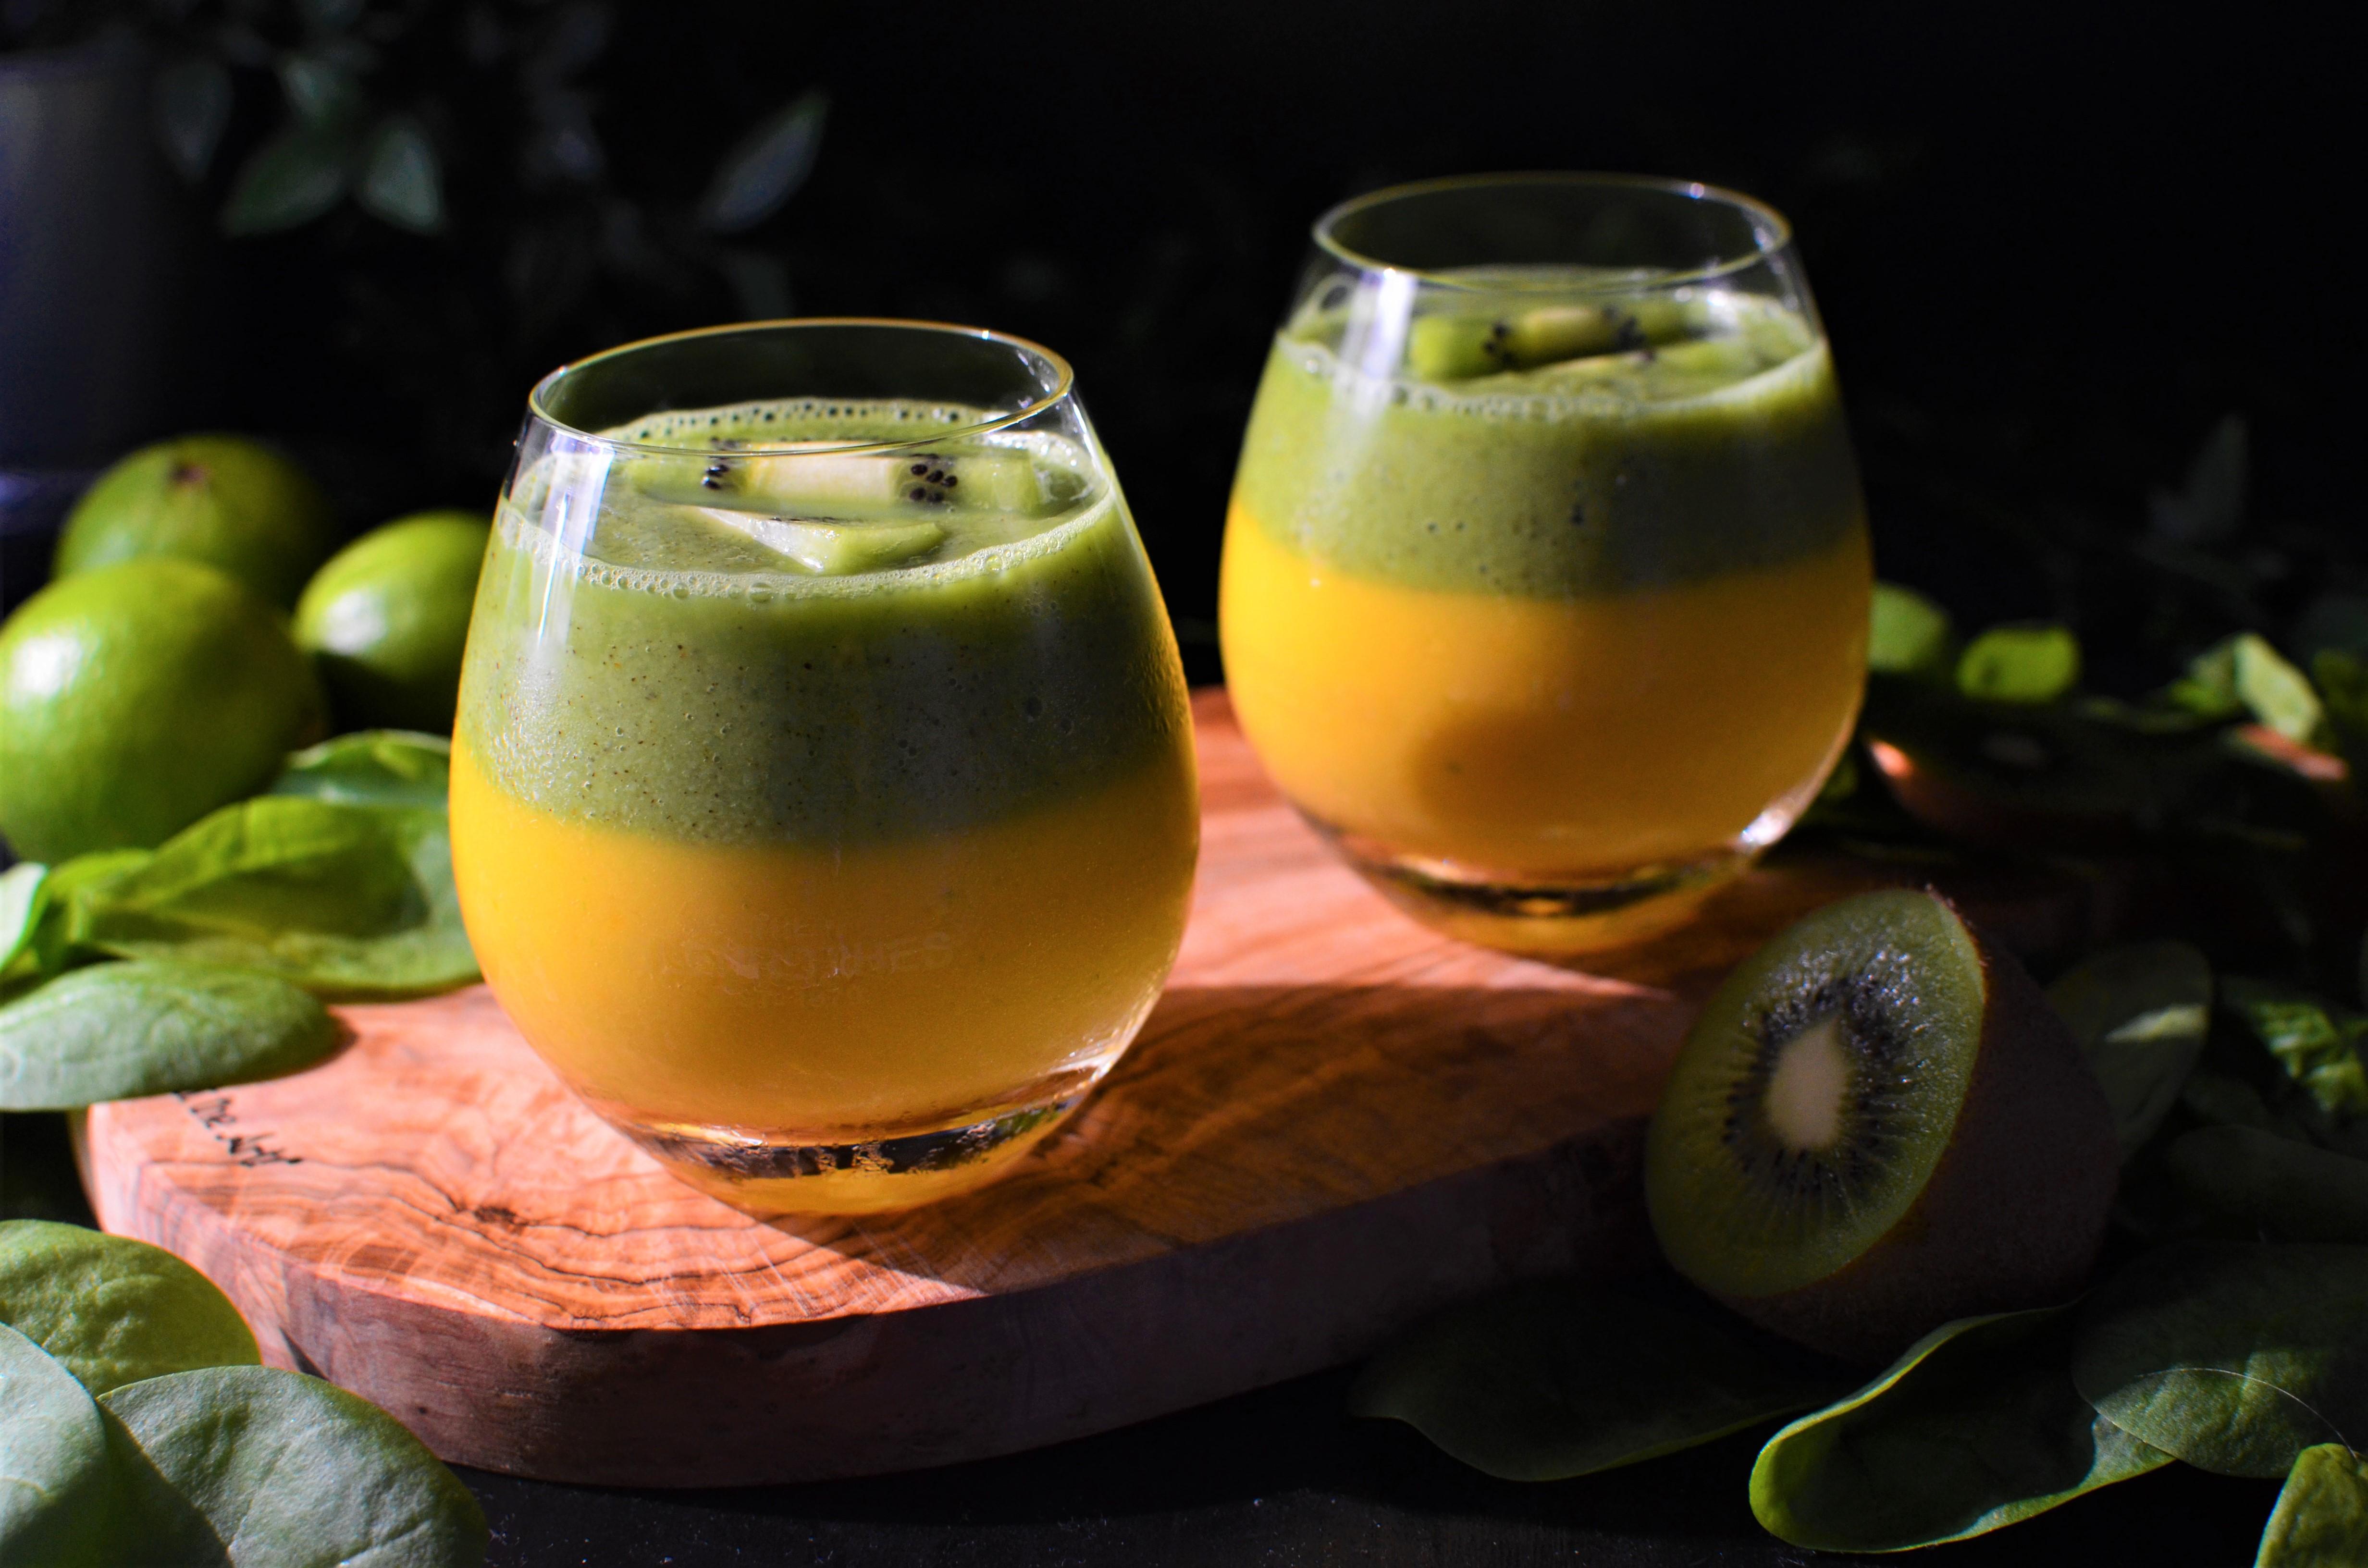 01-Mango-Kiwi-Smoothie